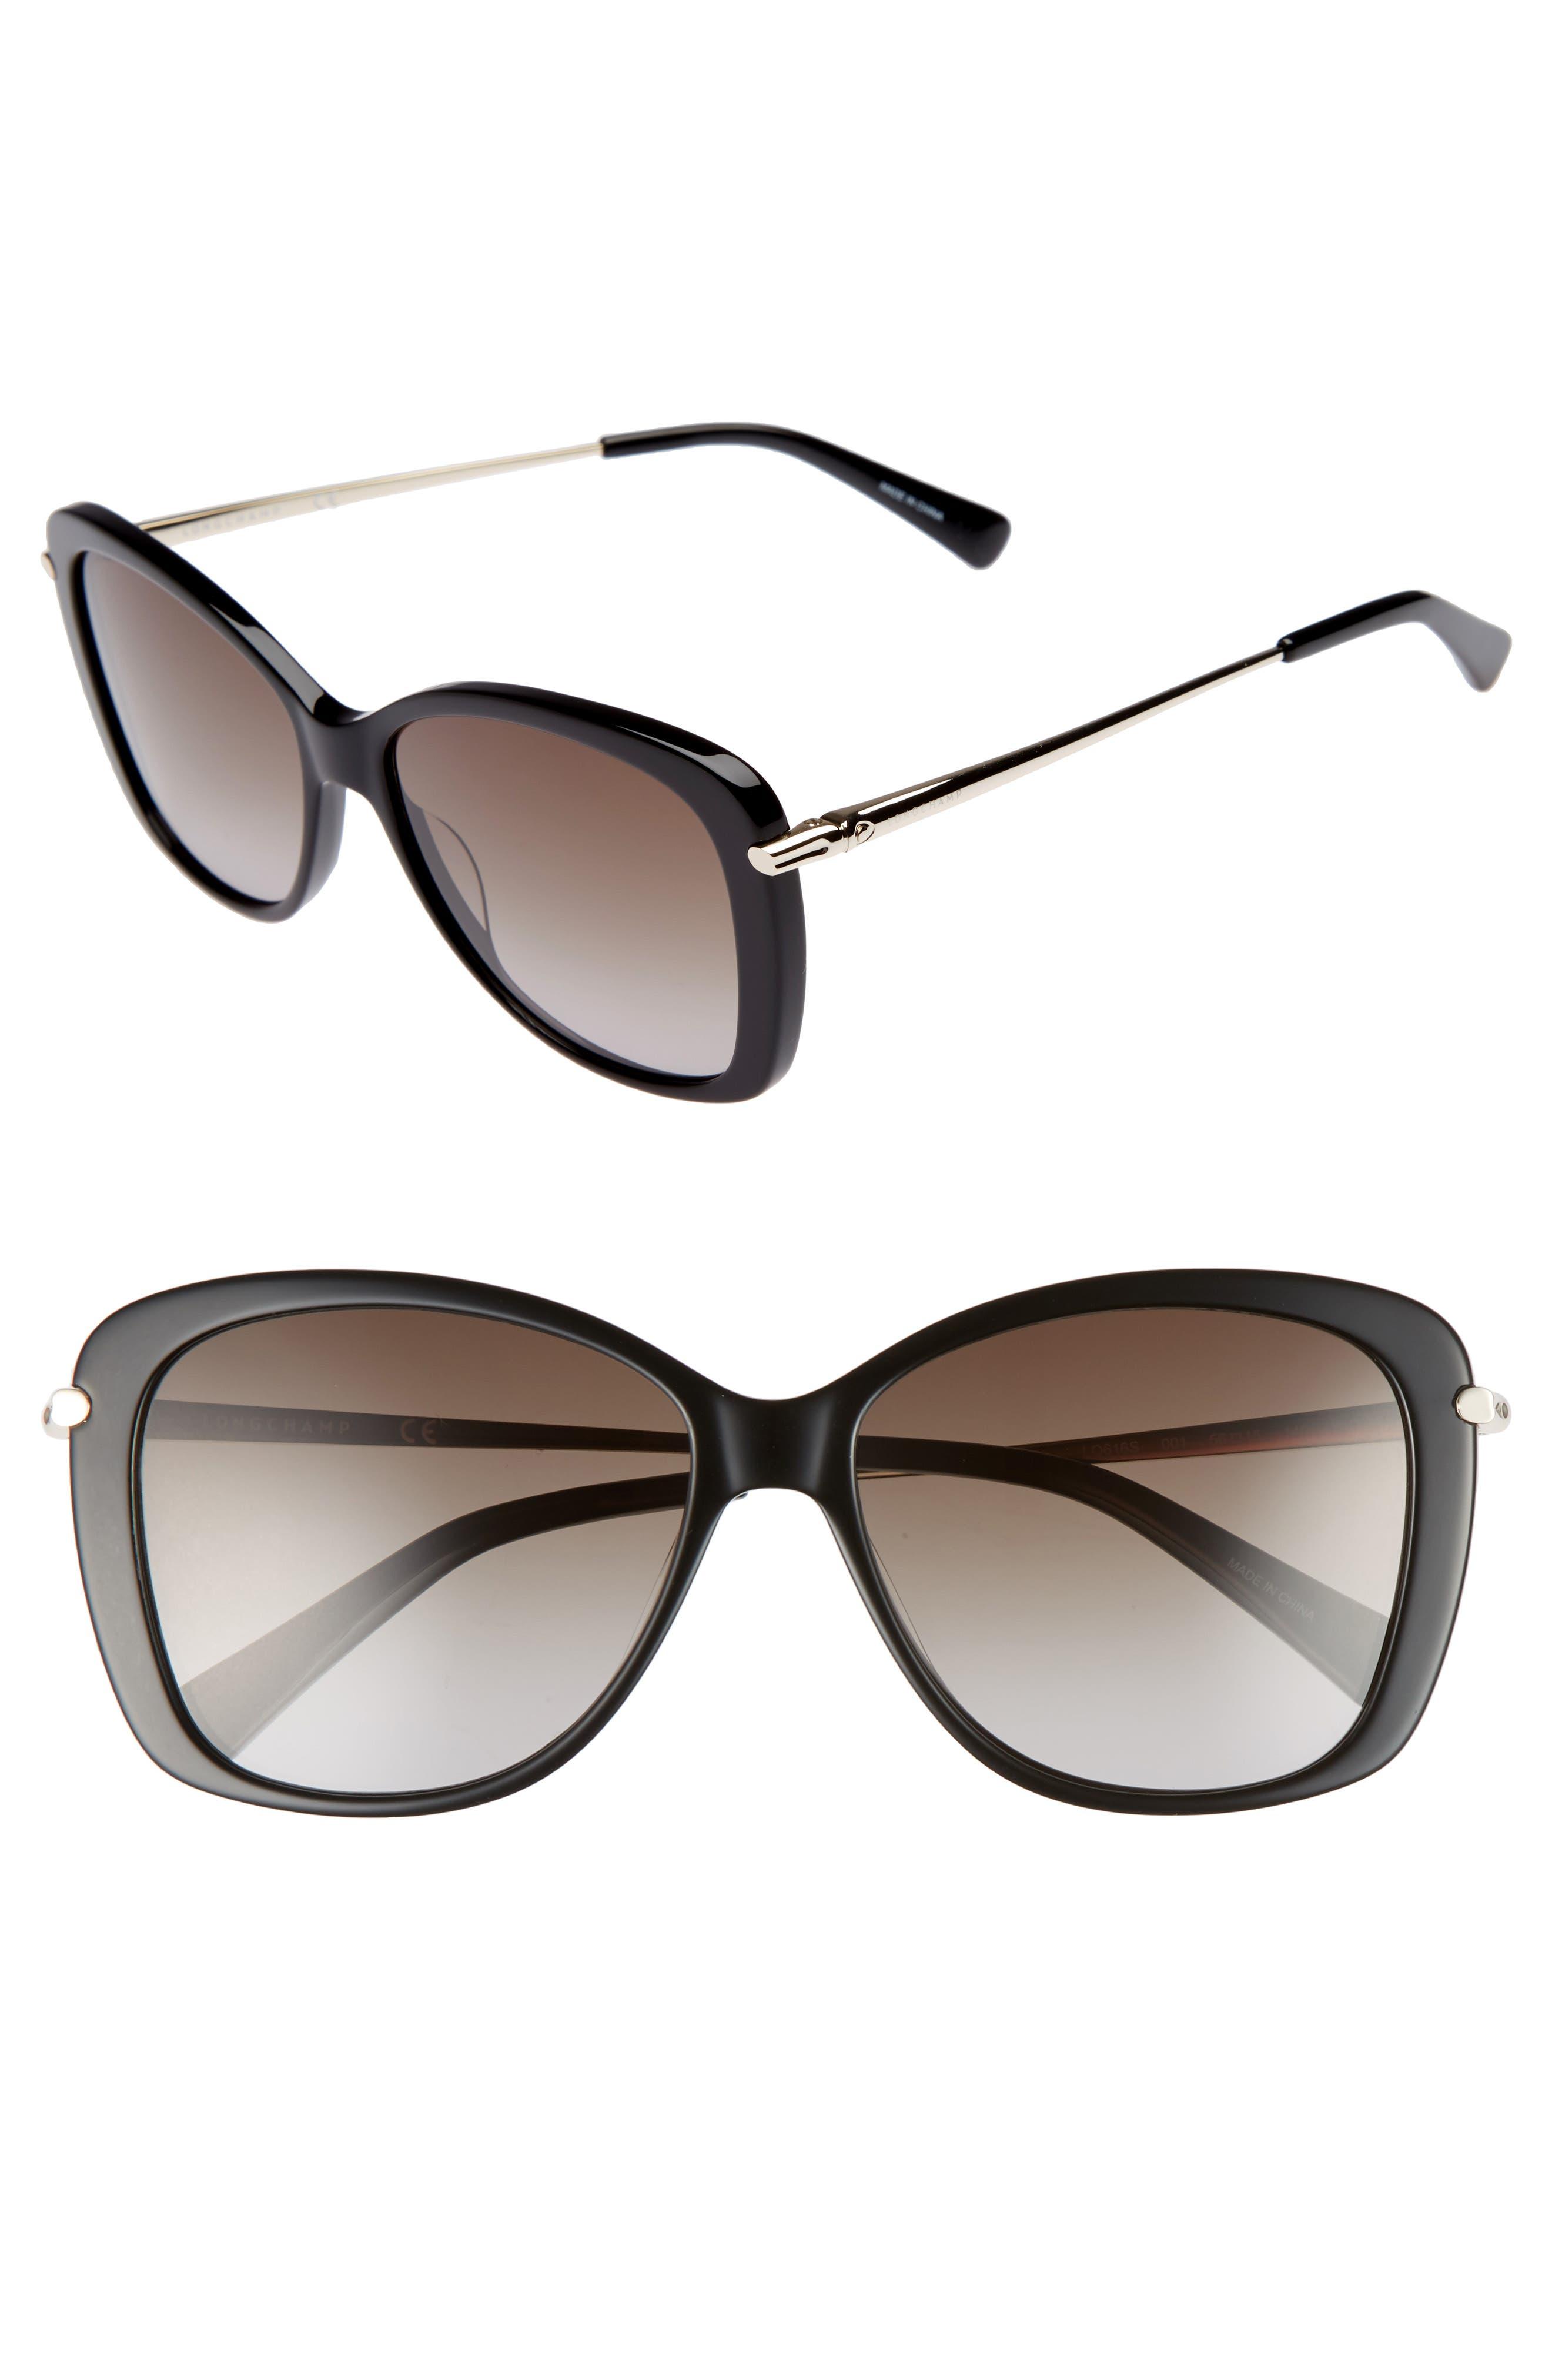 56mm Gradient Lens Butterfly Sunglasses,                         Main,                         color, BLACK